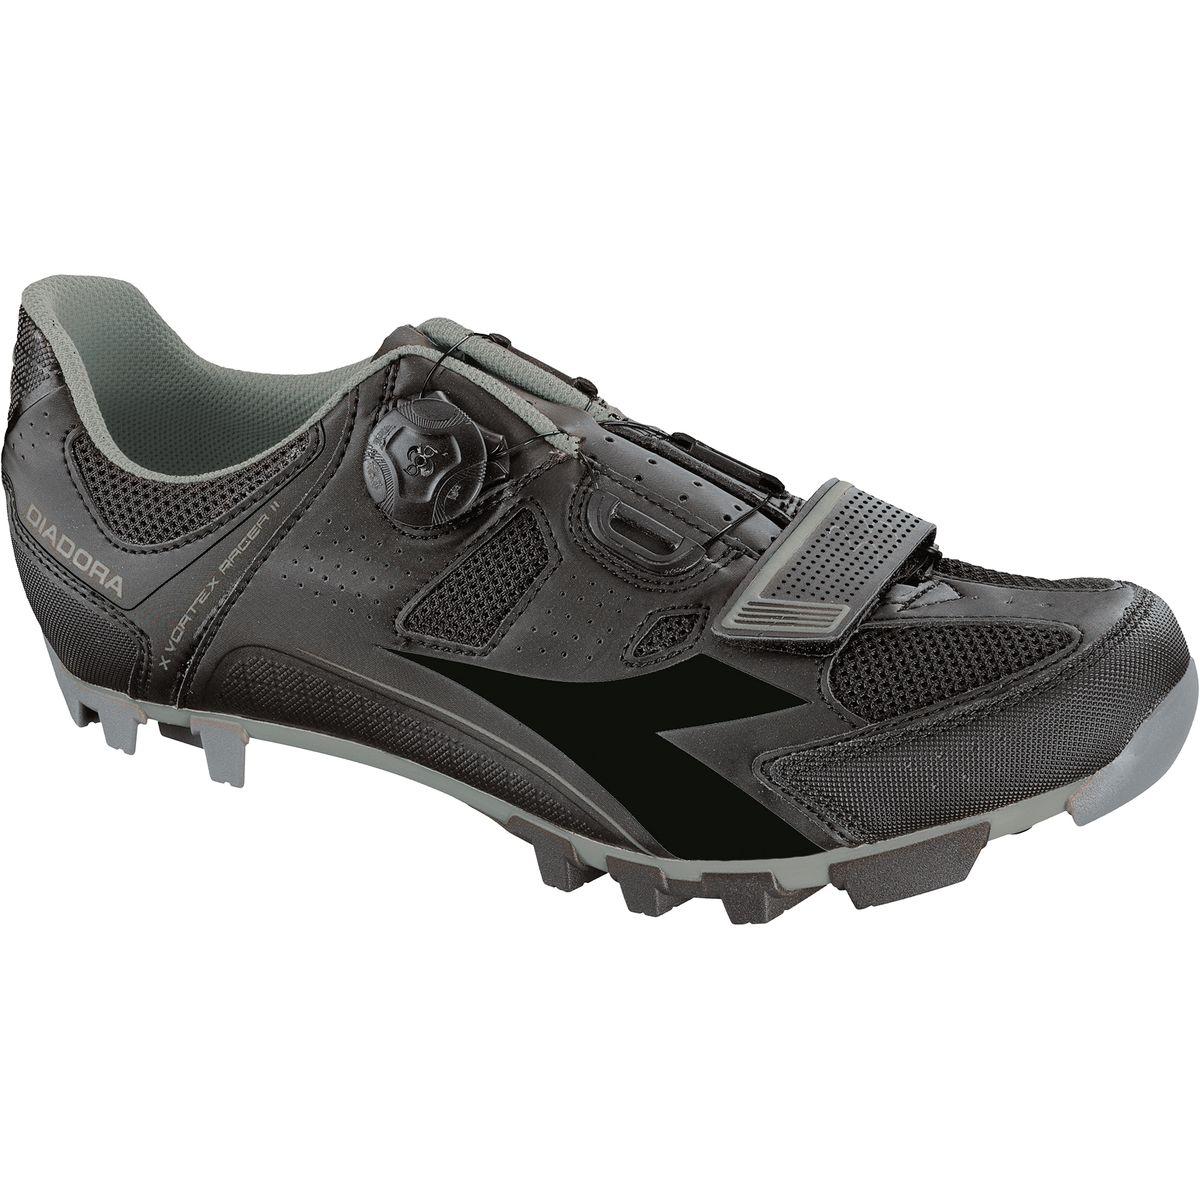 Diadora X Vortex Racer II Cycling Shoe Men's |